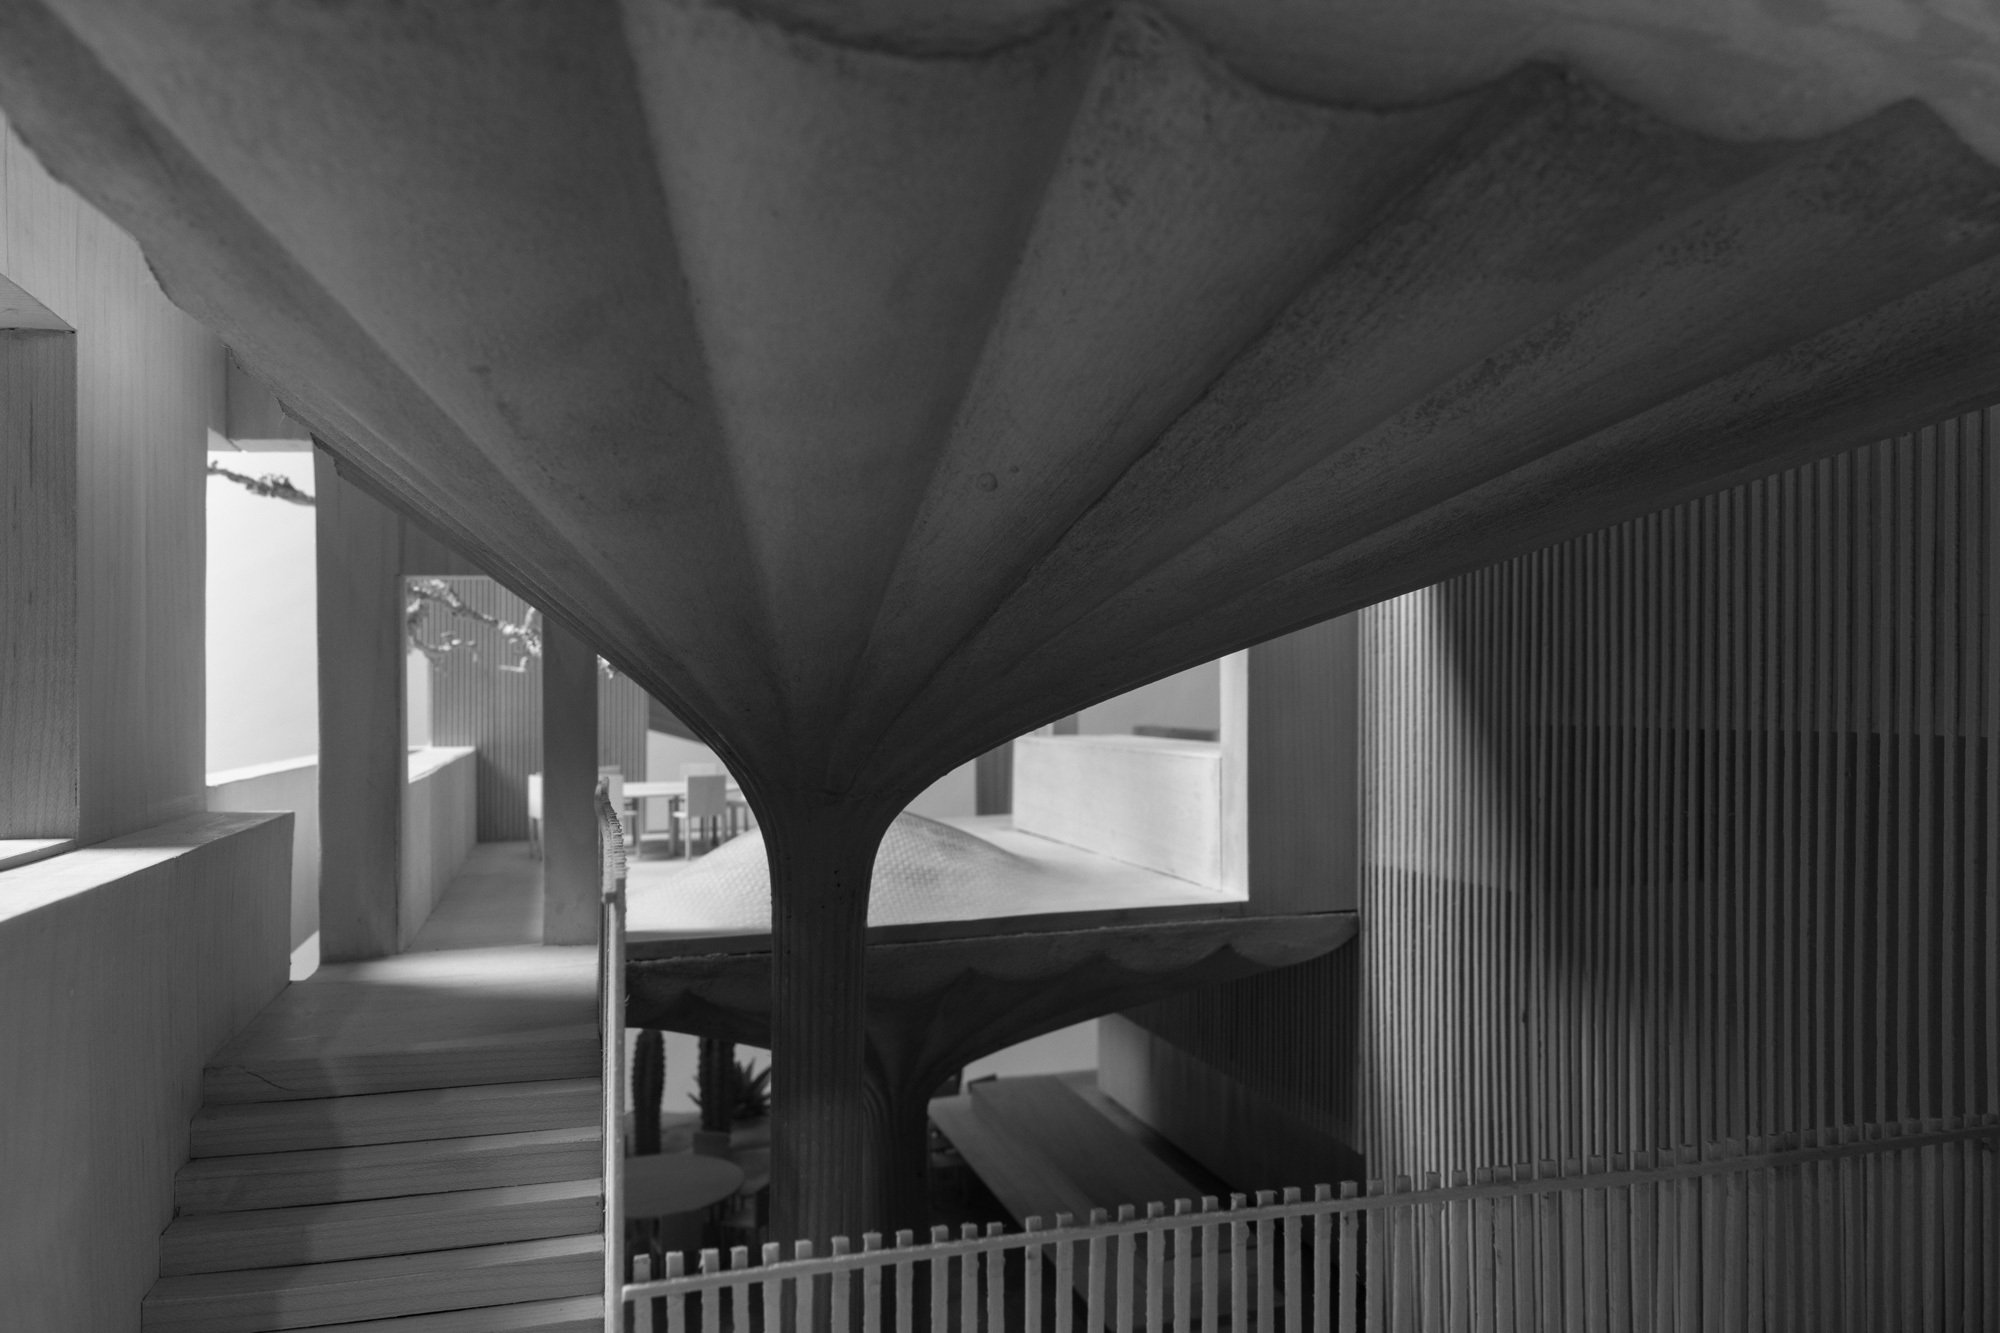 Architektonische Experimente in Material und Form